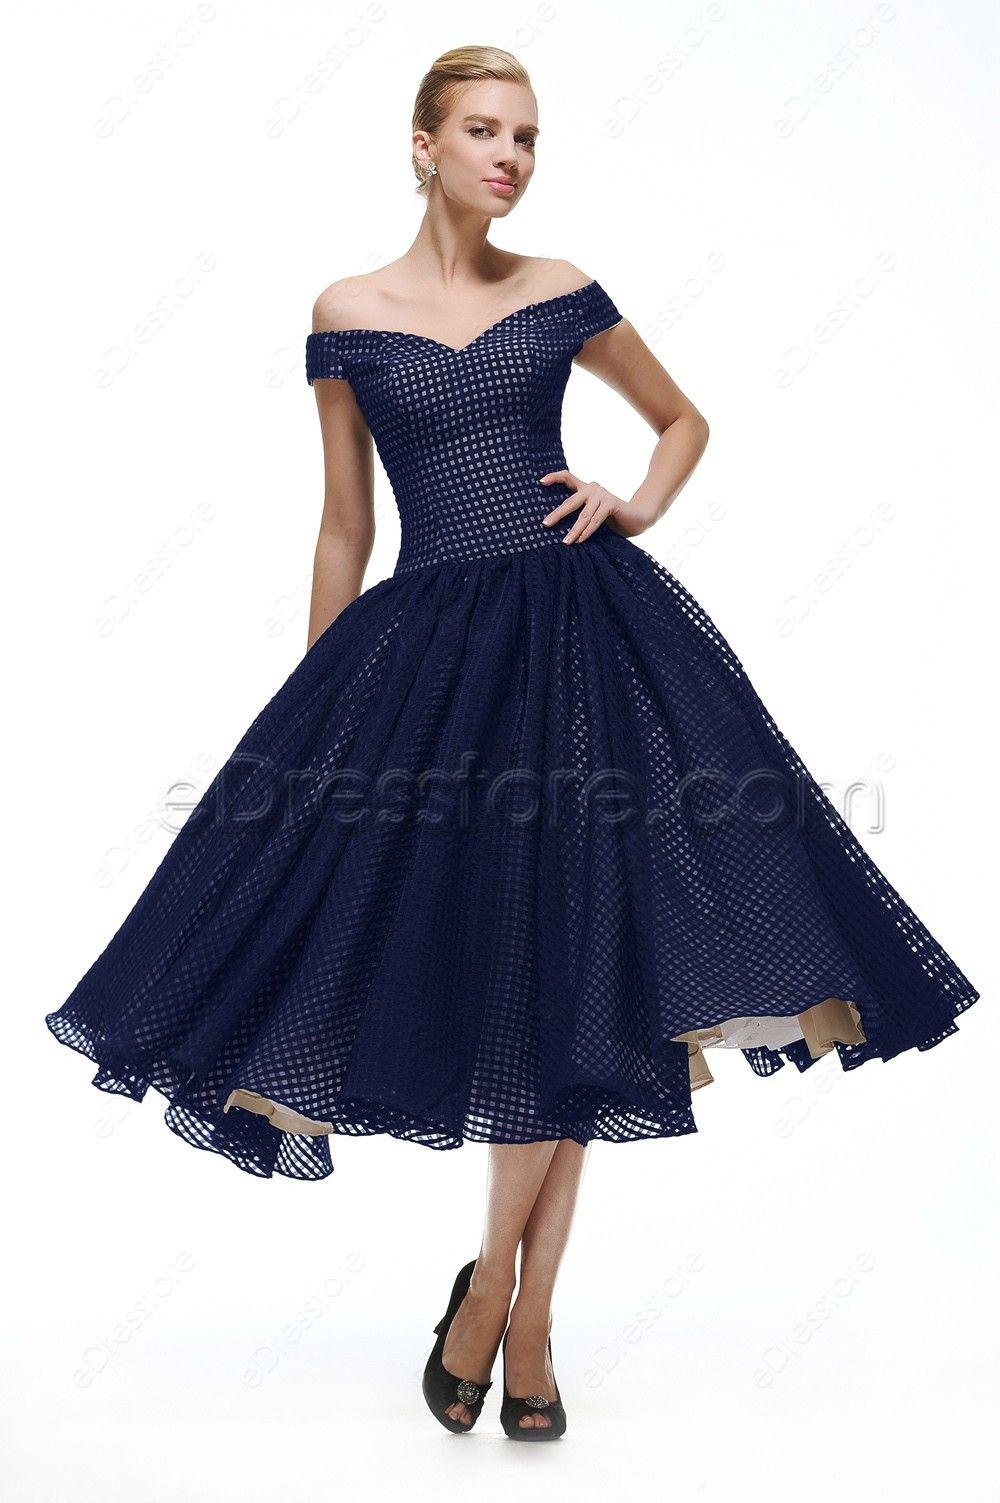 6dadf11e6e42 Off the Shoulder Navy Blue Vintage Prom Dresses Tea Length in 2019 ...